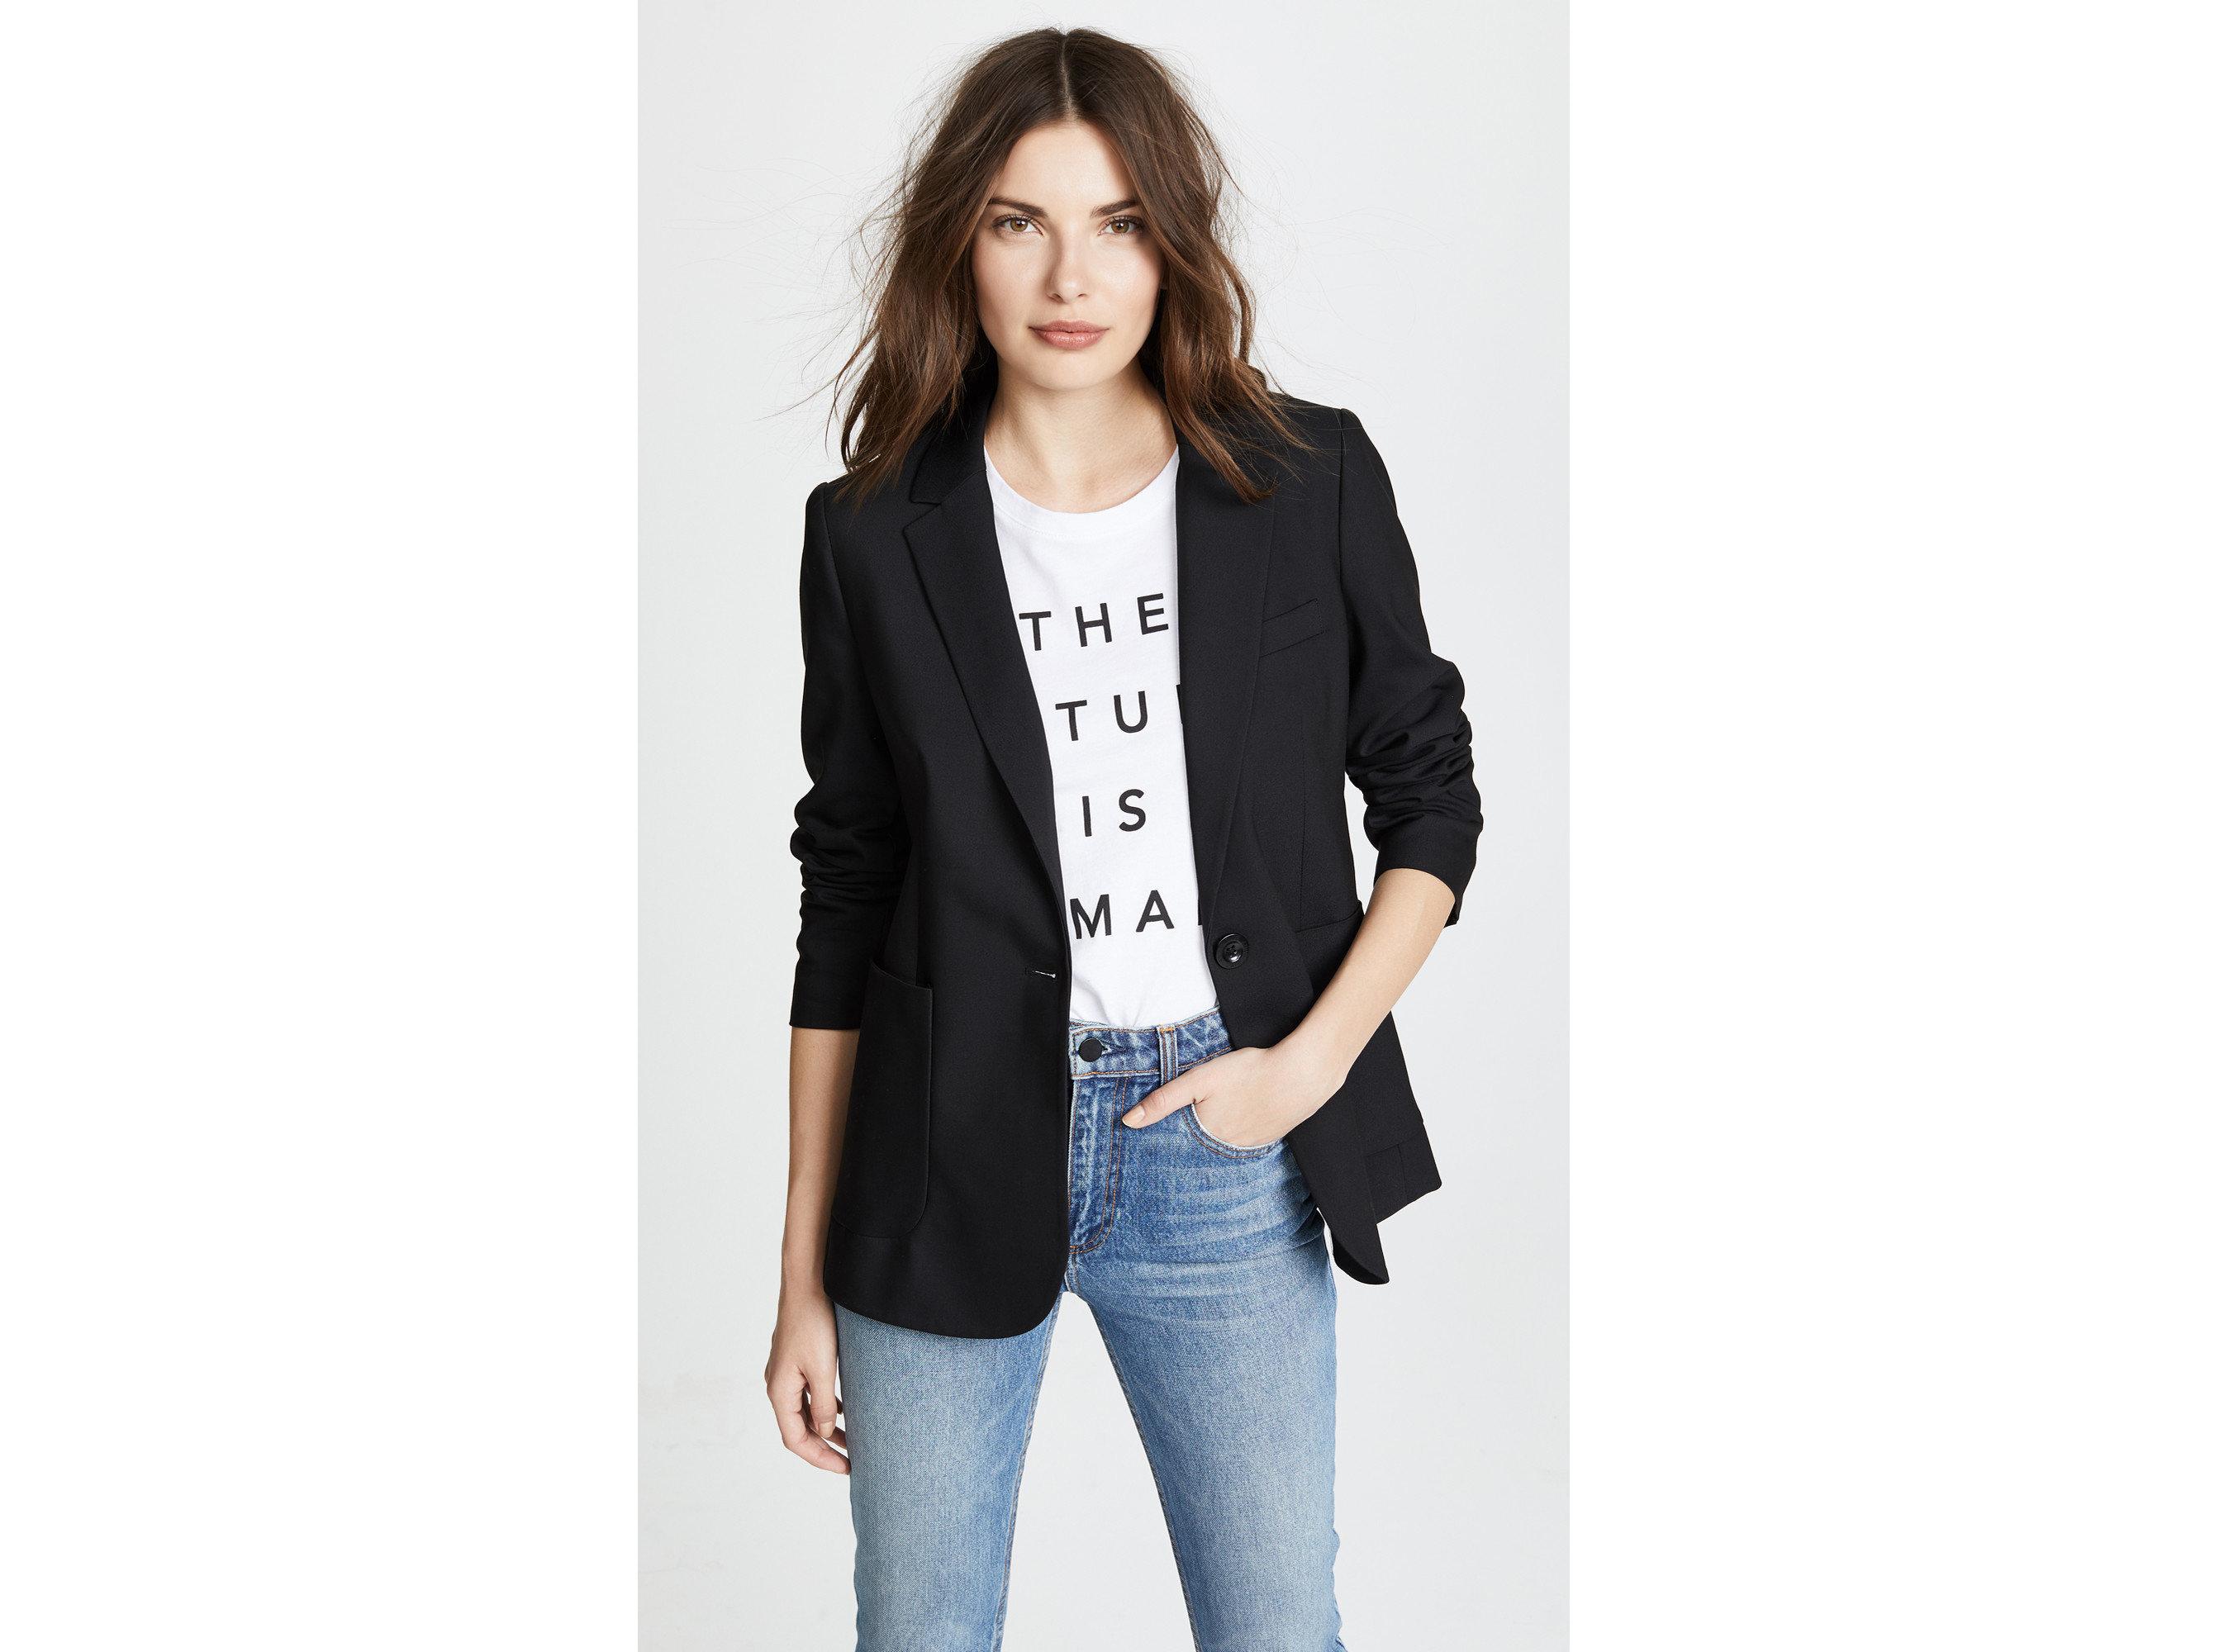 England europe London Luxury Travel Trip Ideas person clothing blazer jacket posing standing outerwear formal wear shoulder sleeve case fashion model suit coat trouser